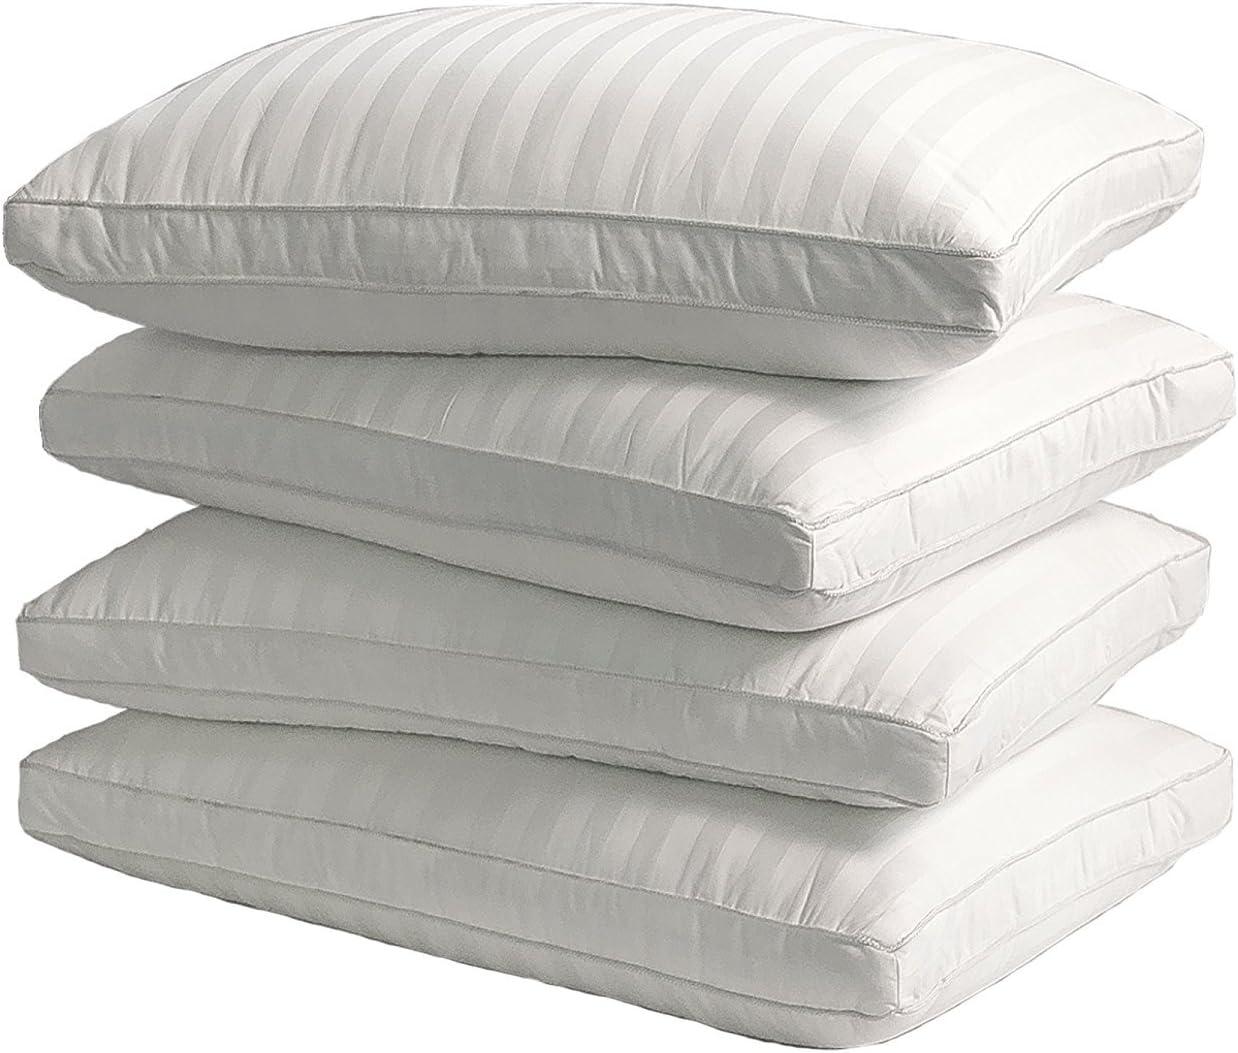 Blue Ridge Home Fashions 350 Thread Count Cotton Damask Optima-Loft Down Alternative Pillow (4 Pack), Jumbo, White